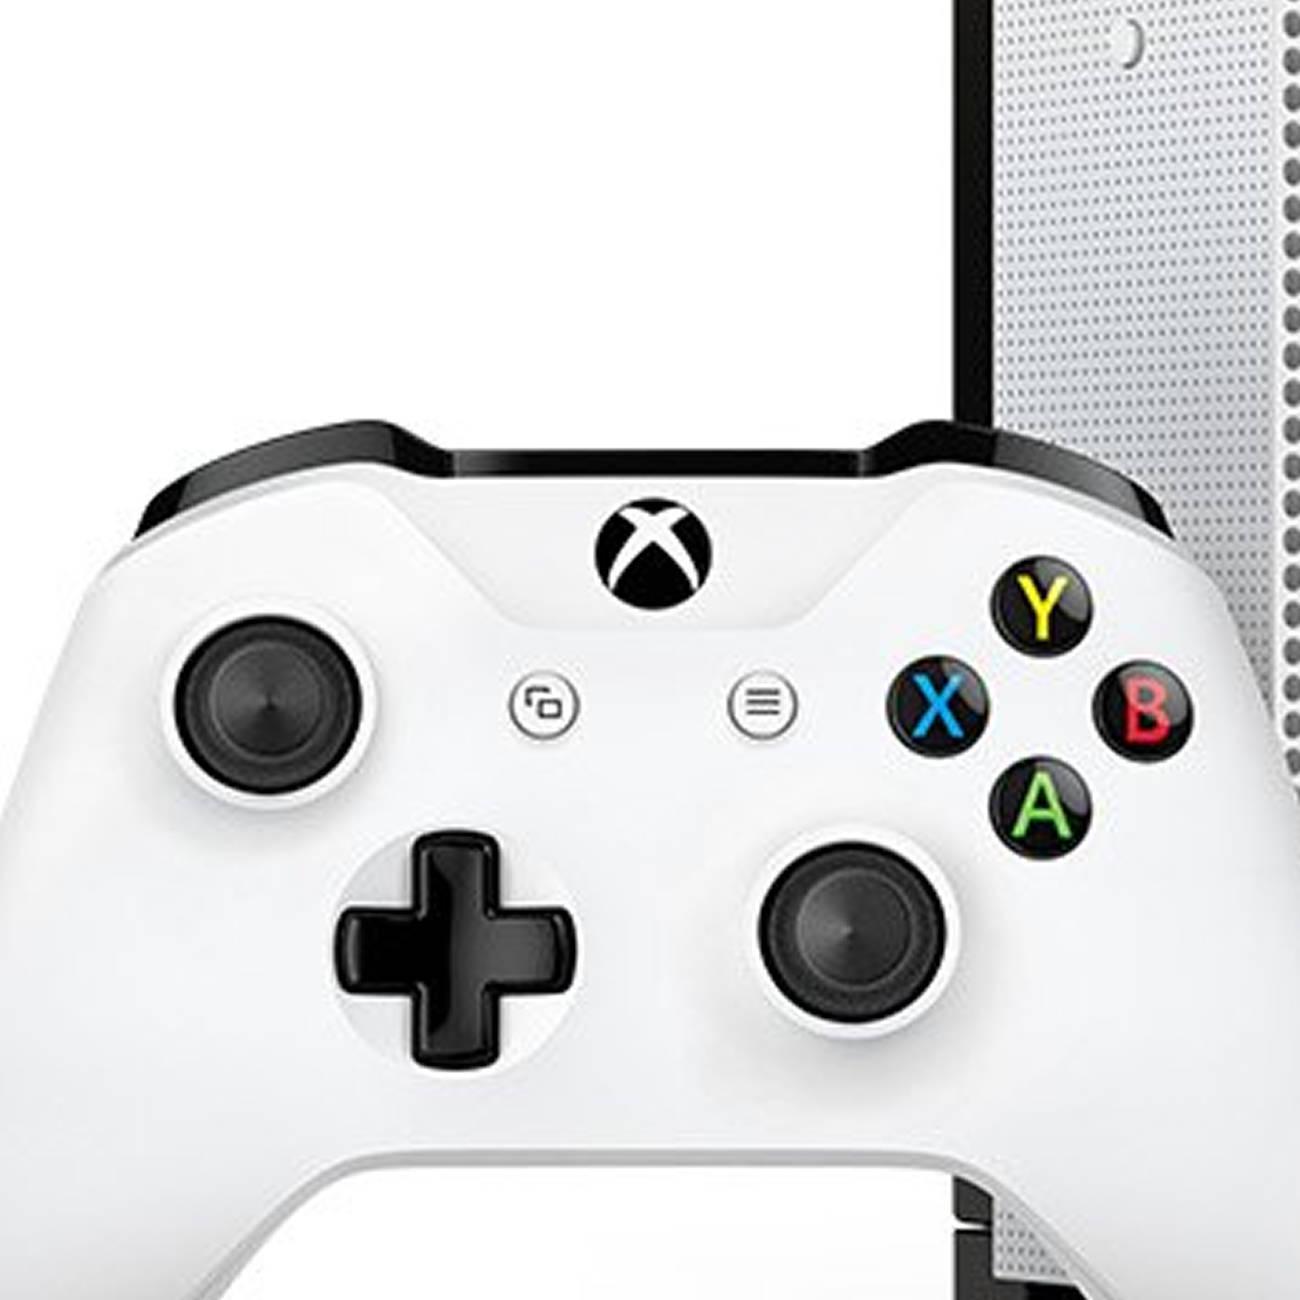 Xbox One S All-Digital Edition。ダウンロード版ハード